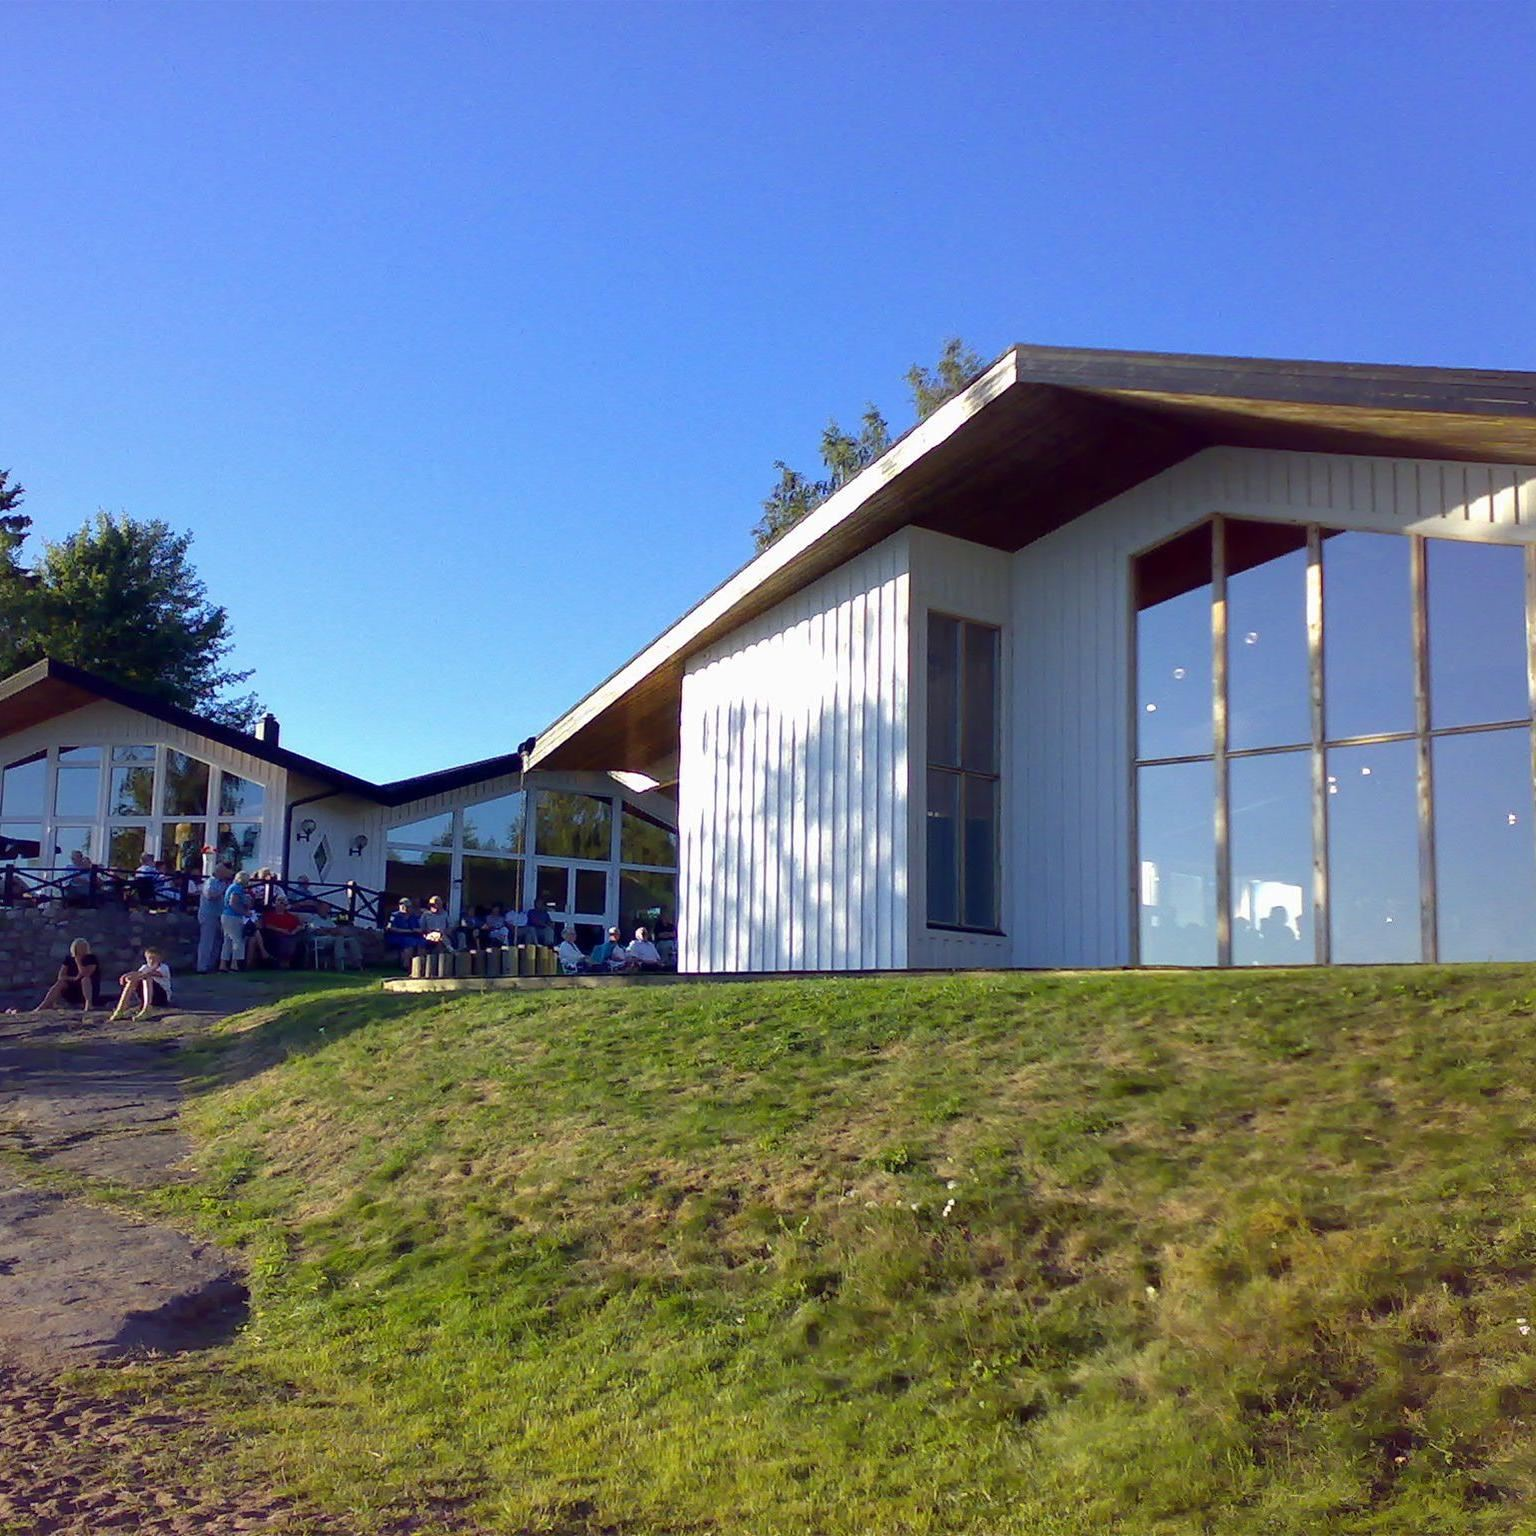 Café Kröngården